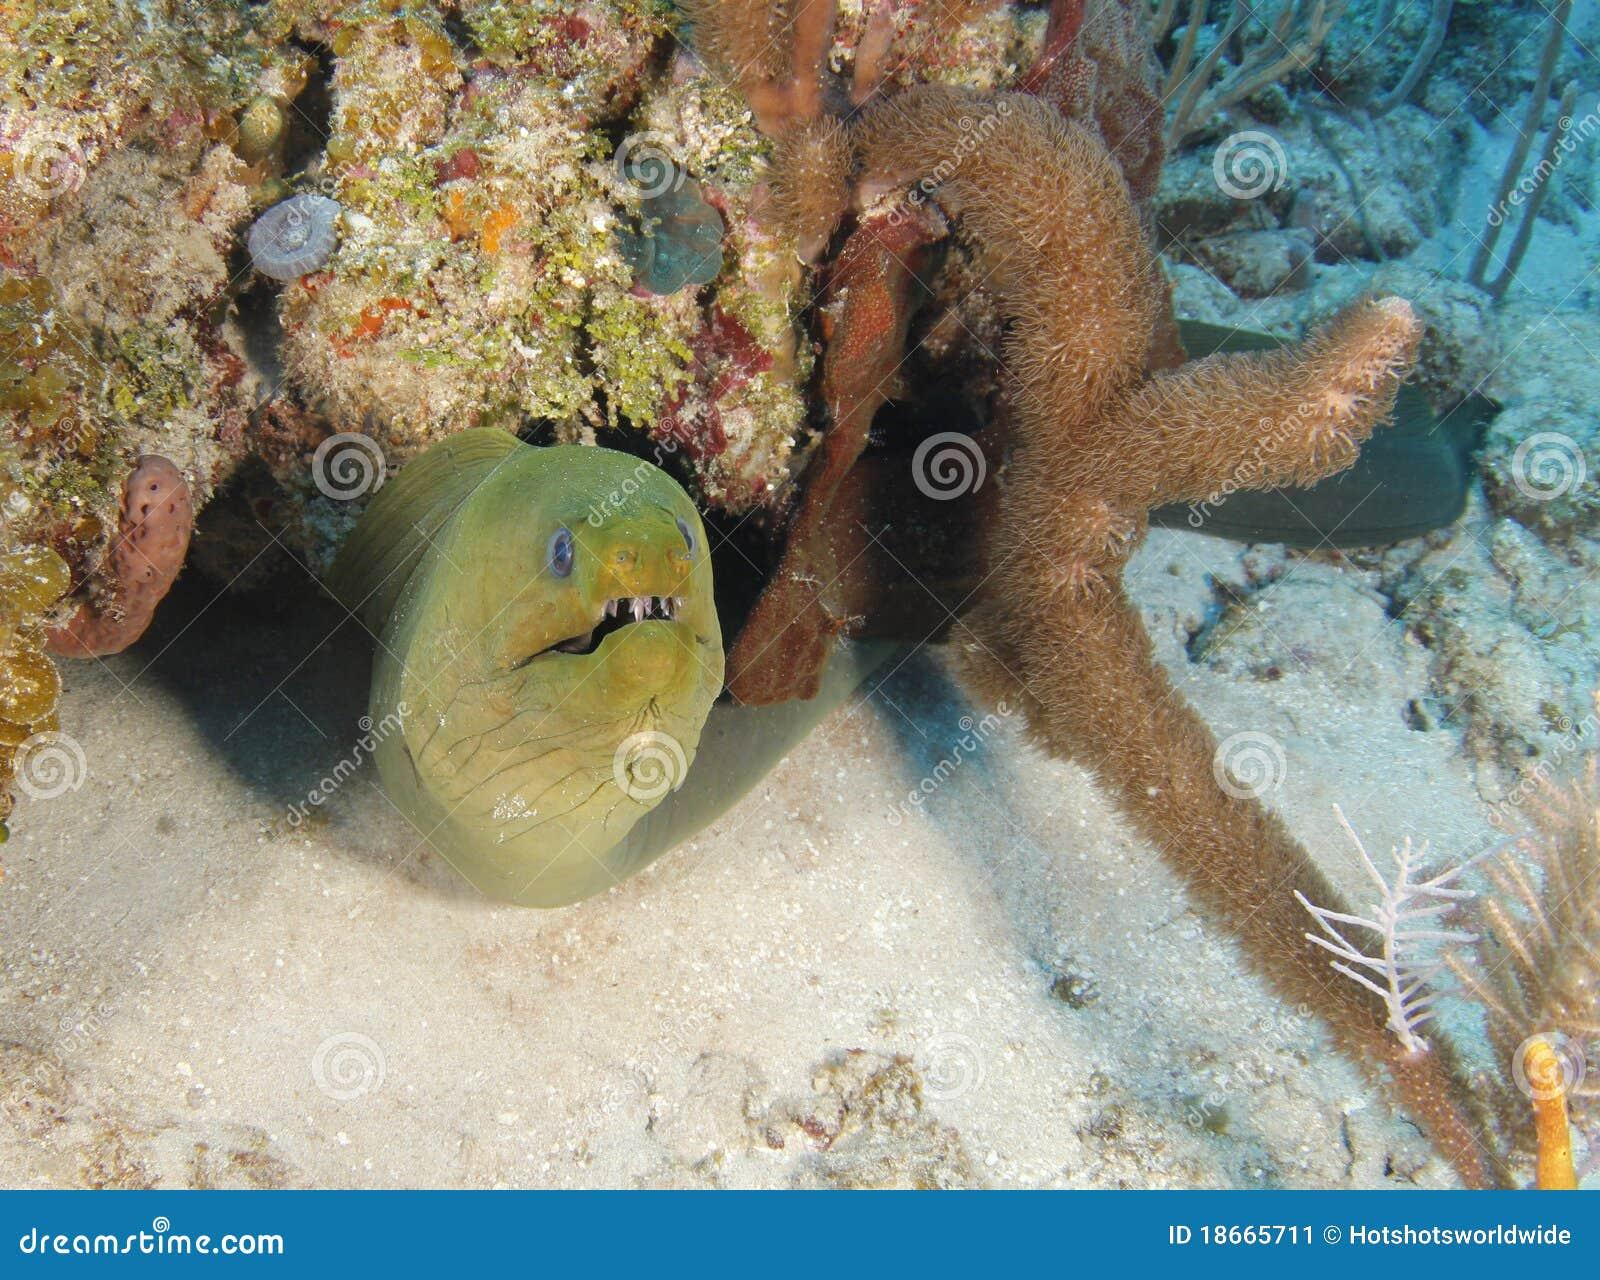 Giant underwater snake - photo#4